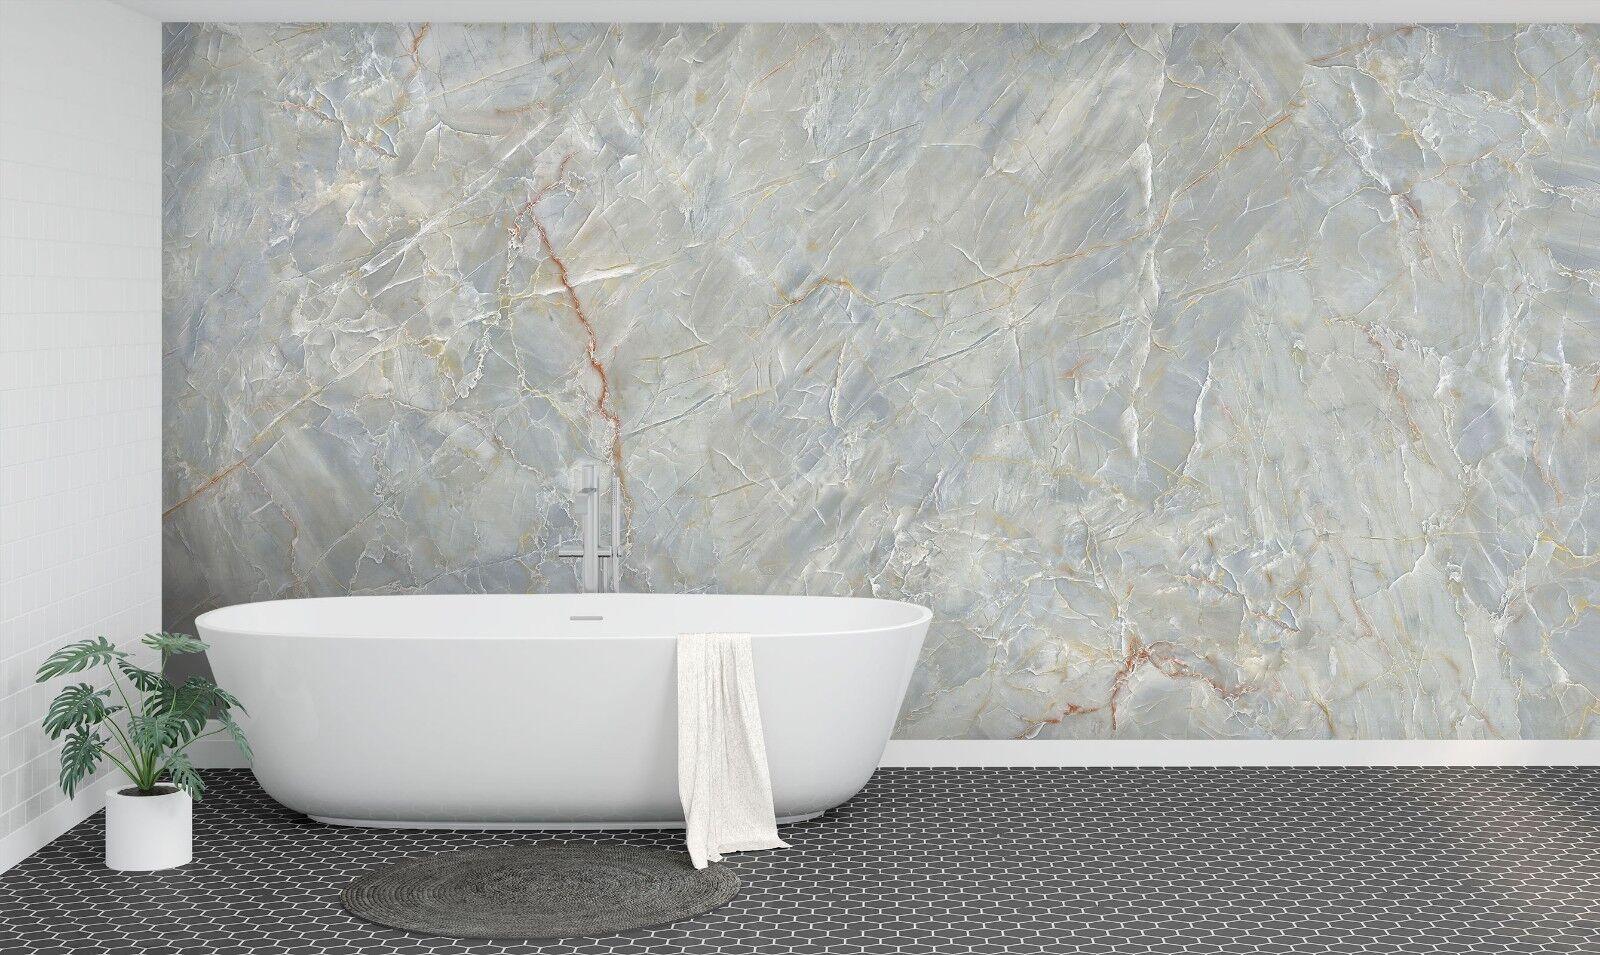 3D Jade Fragmentation 411 Texture Tiles Marble Wall Paper Decal Wallpaper Mural